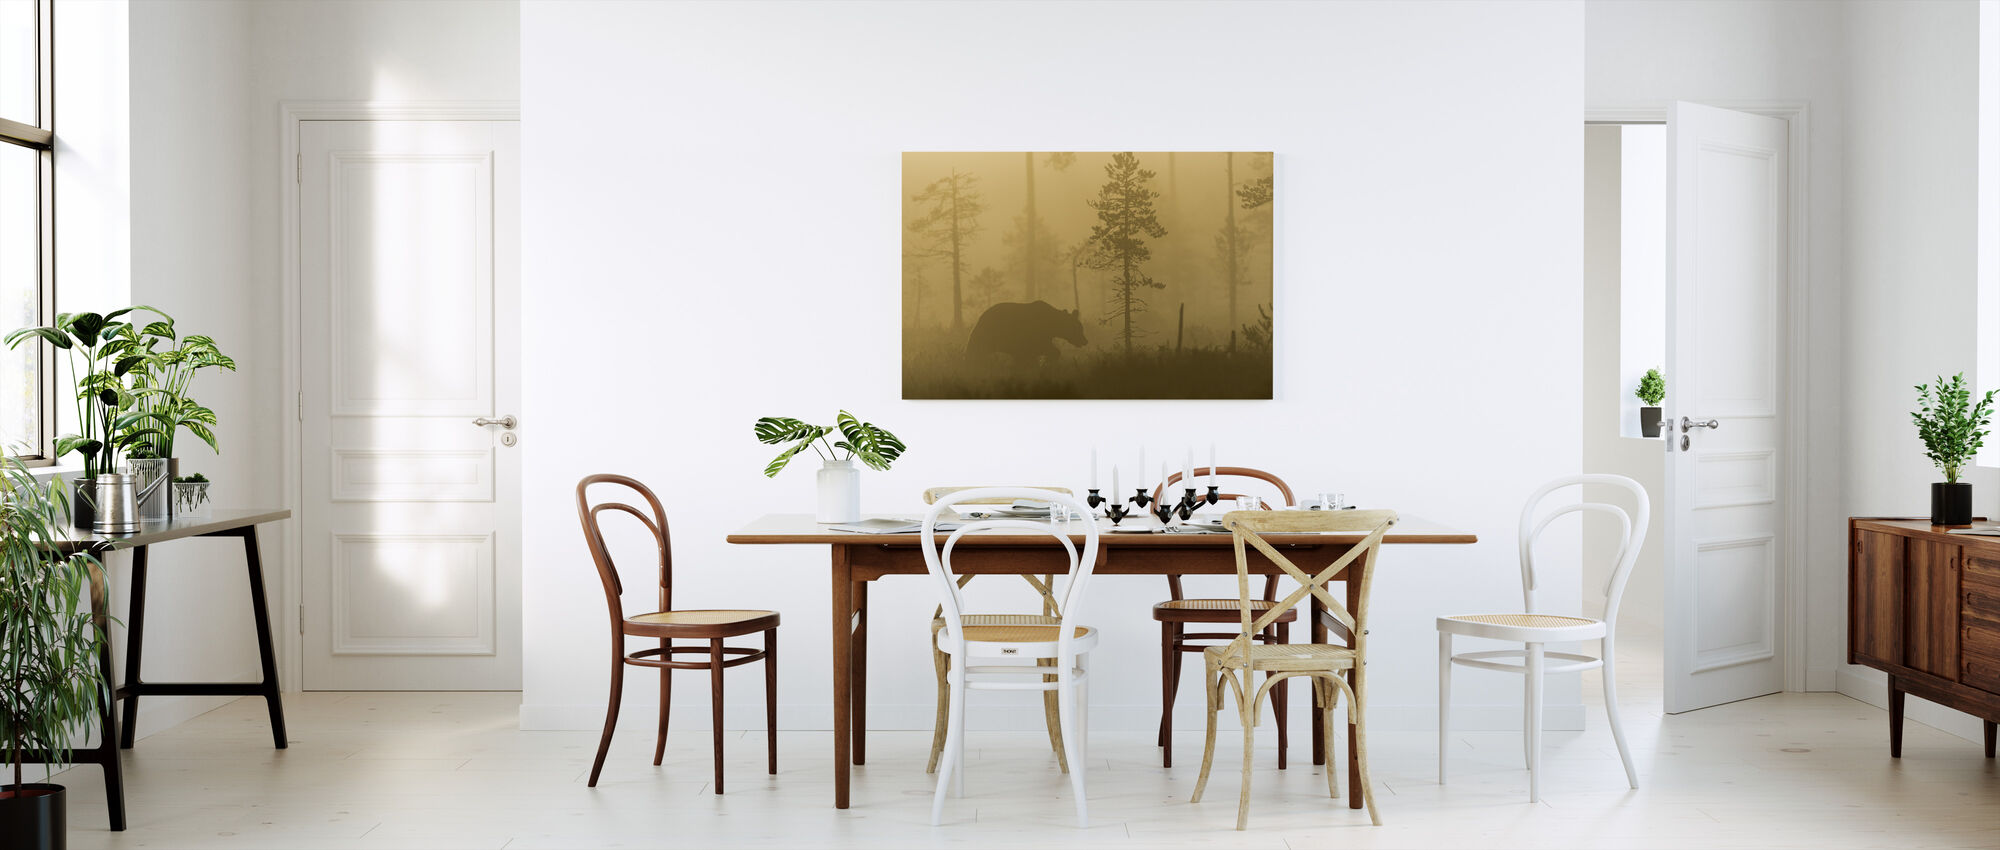 Bear in Morning Fog - Canvas print - Kitchen